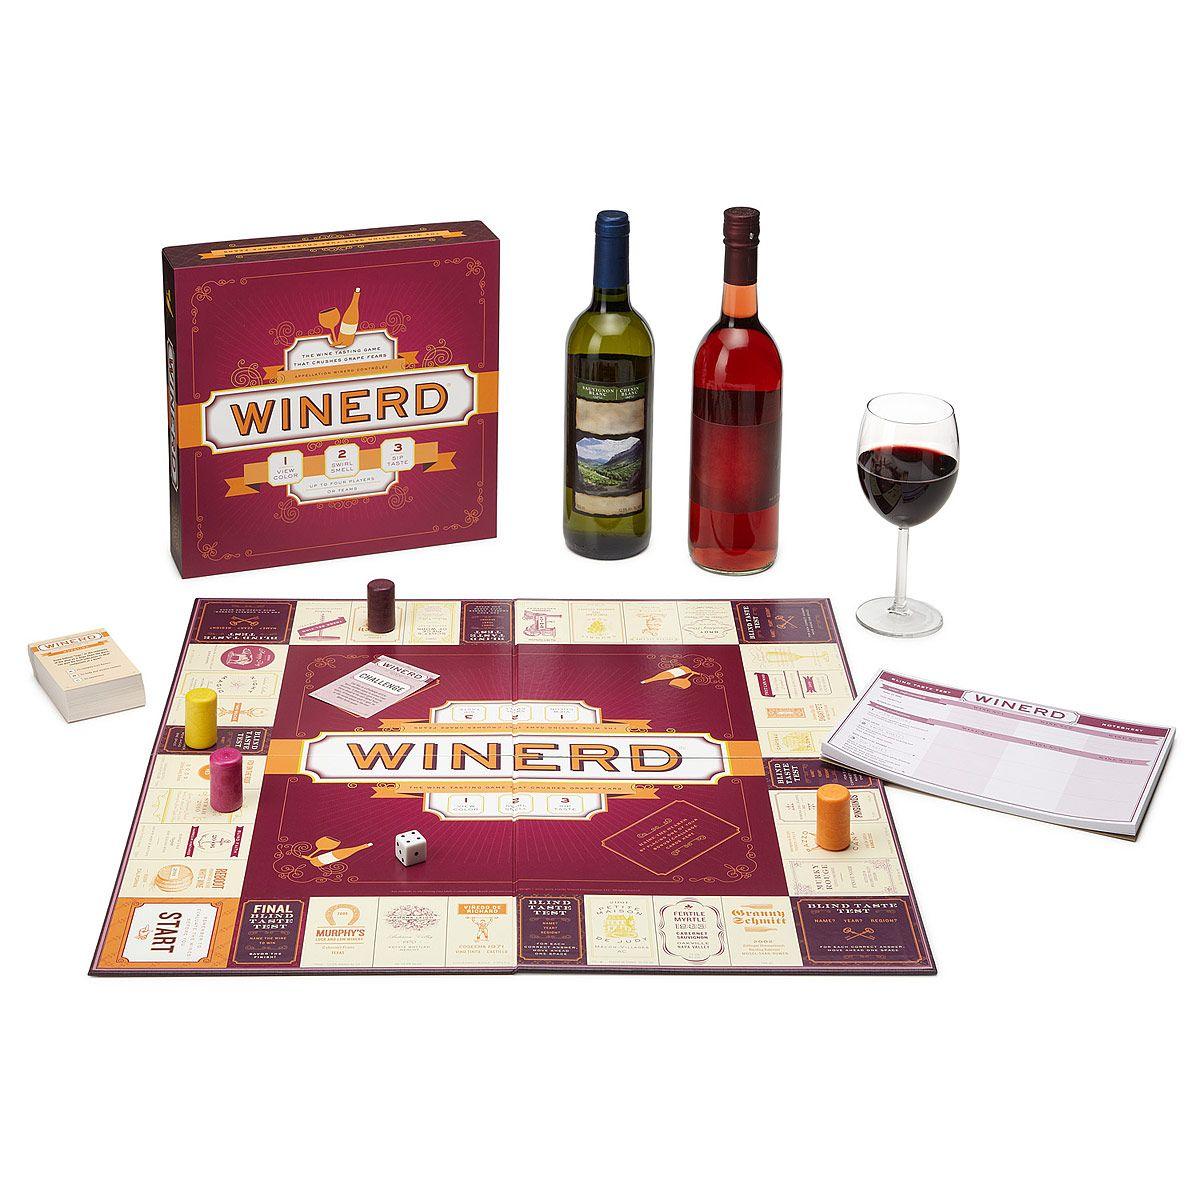 Wine Bottle Shapes Wine Games Drinking Games School Games For Kids